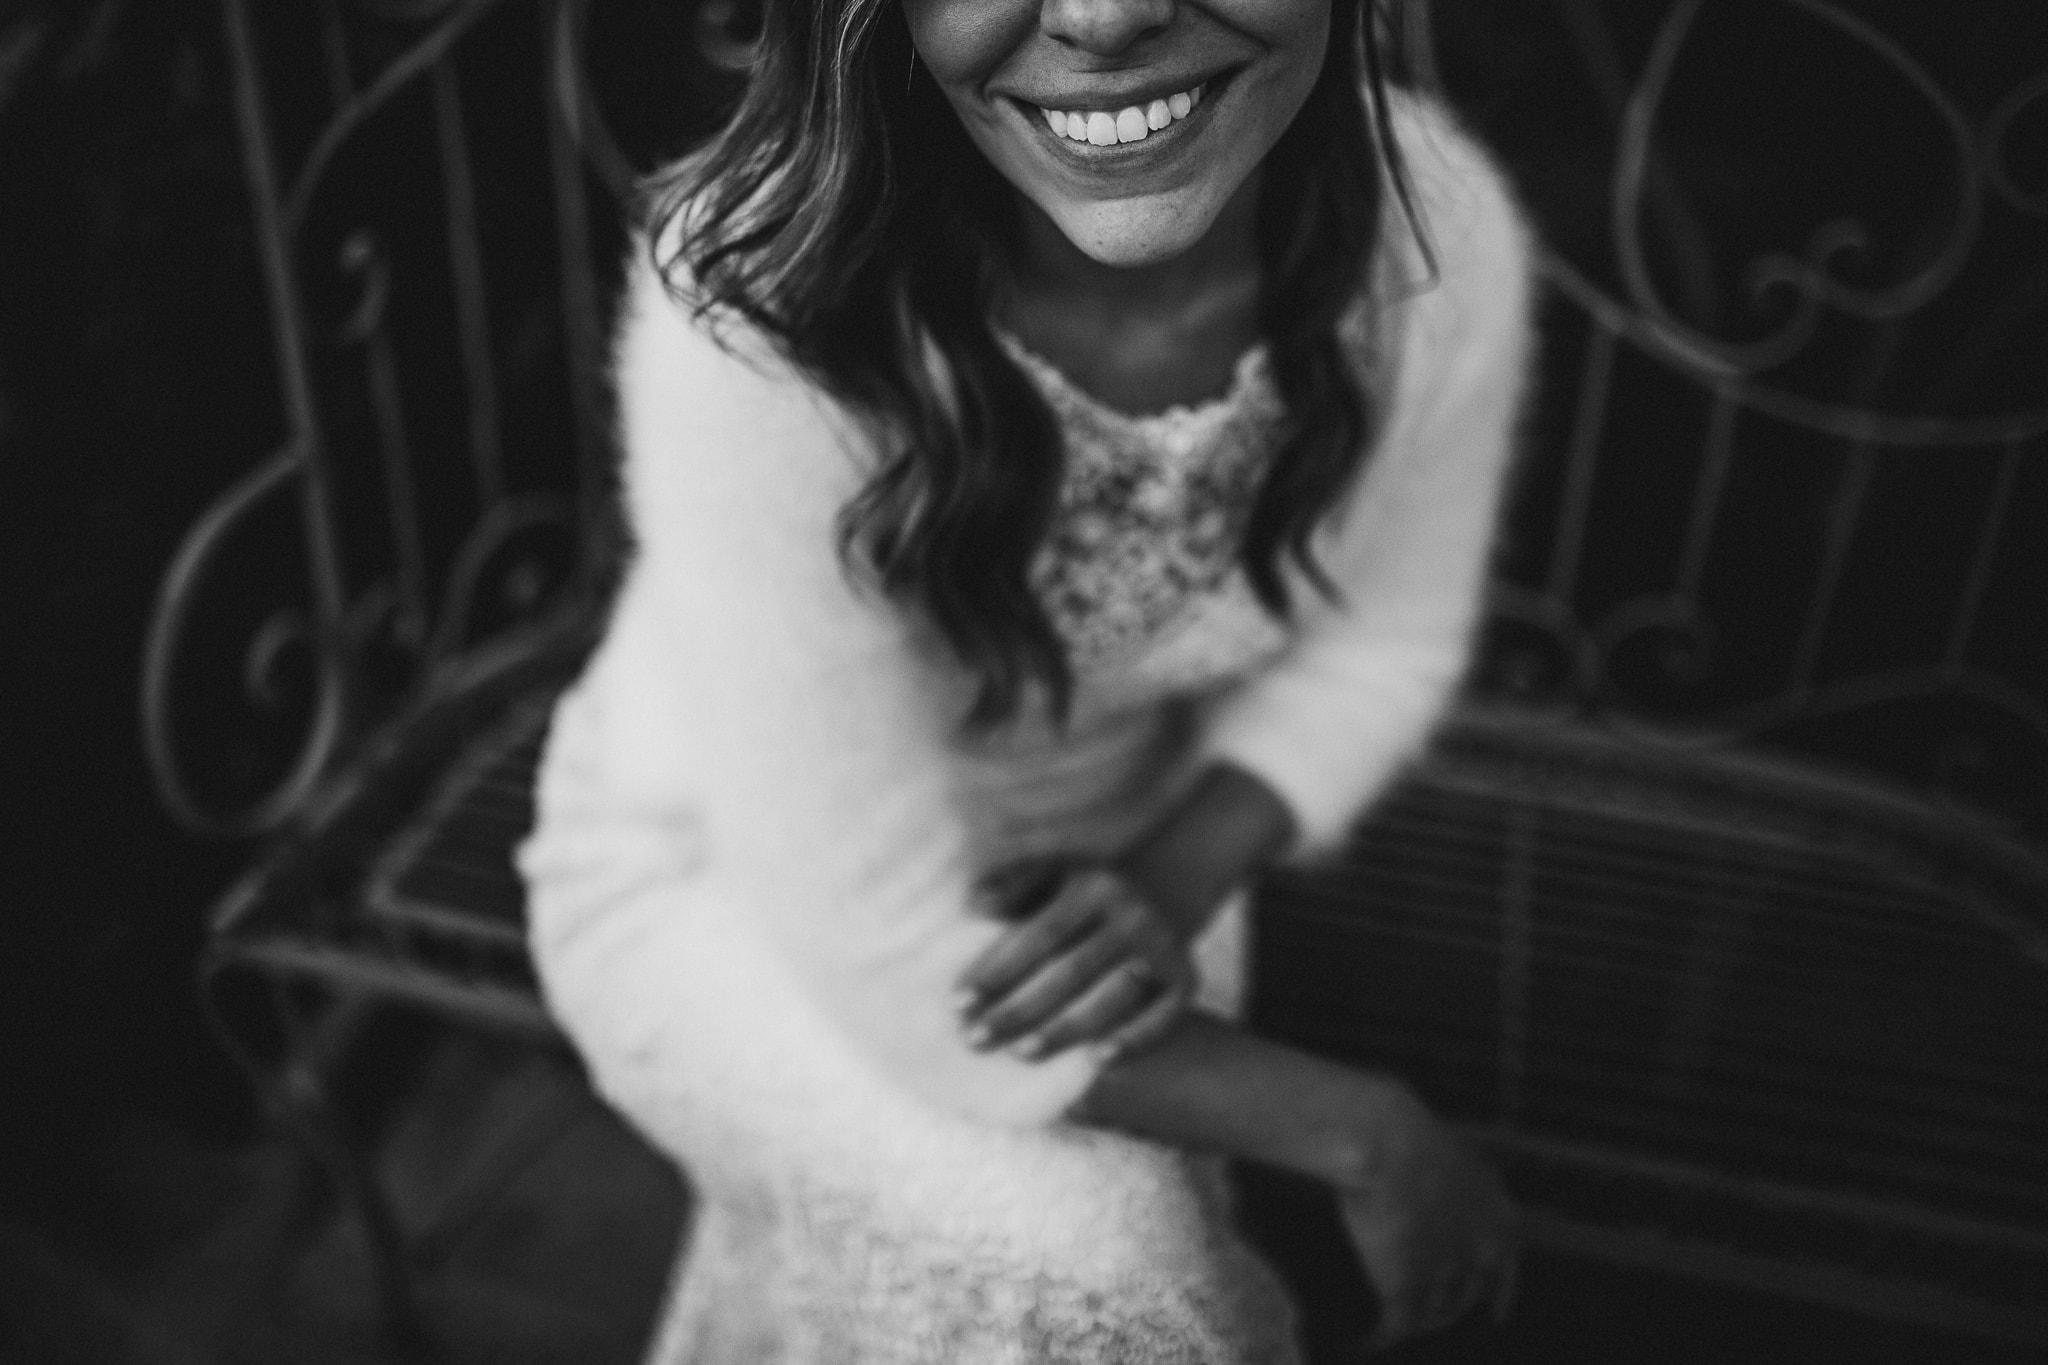 Fotografo-bodas-Cigarral-de-las-Mercedes-126